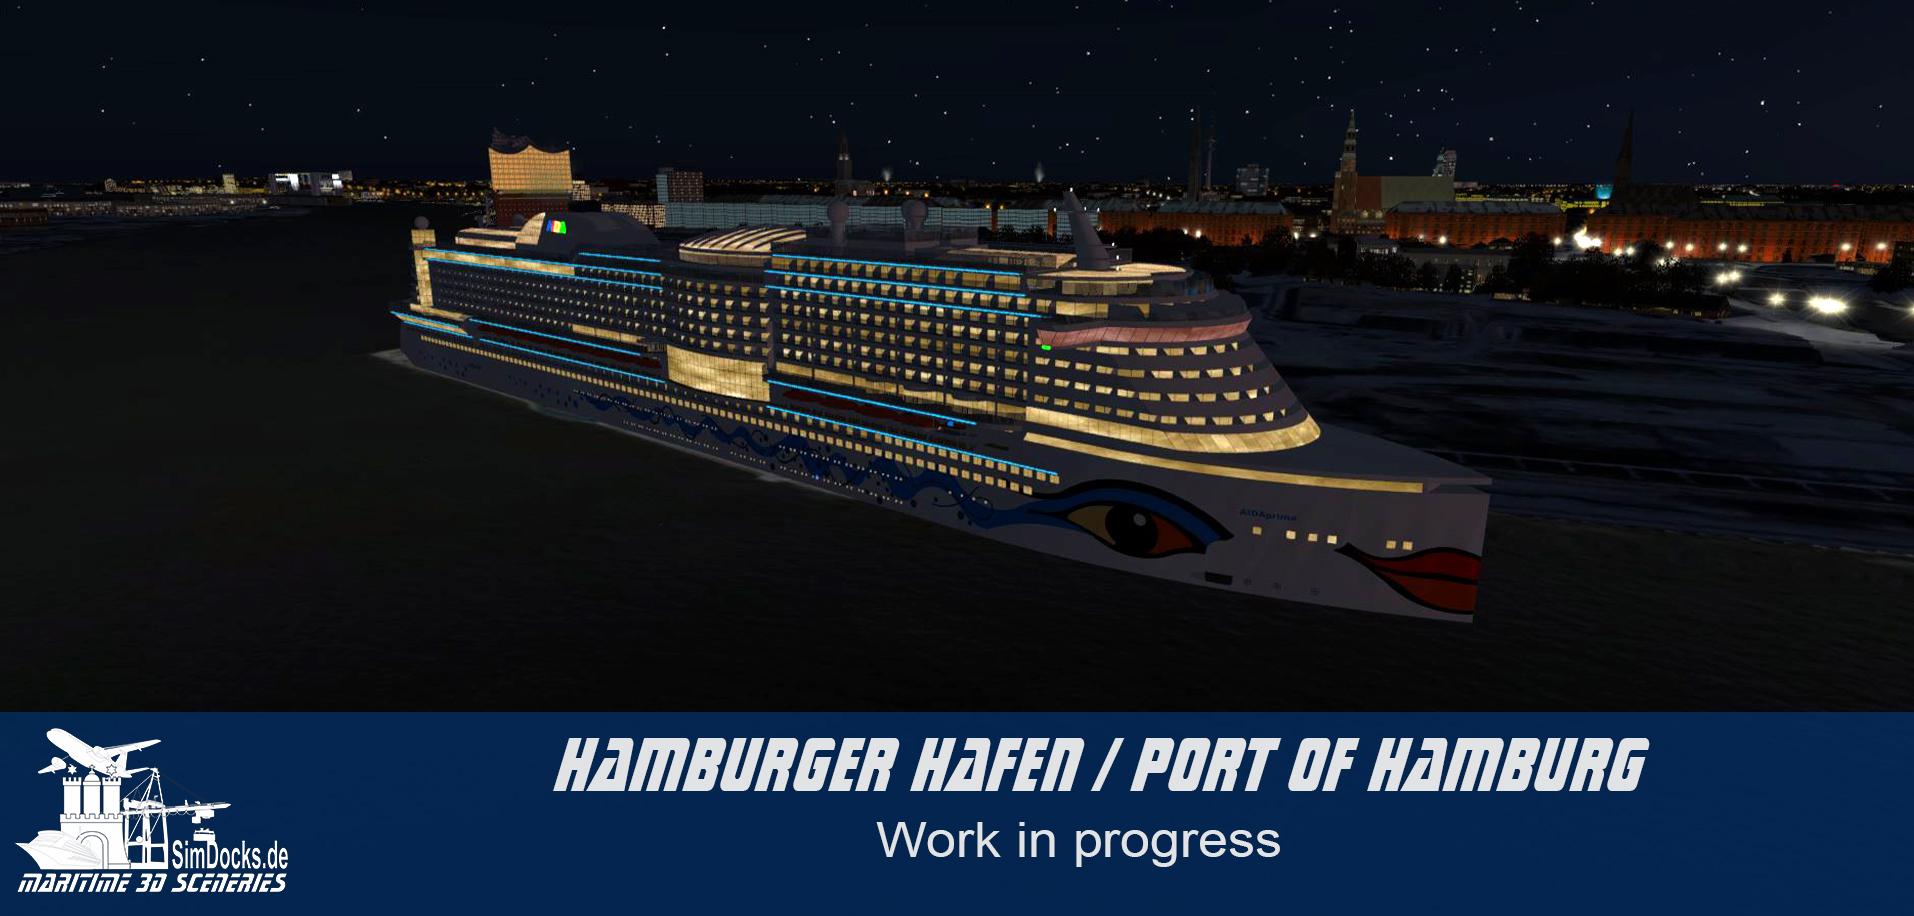 HH-Port_bau79_Nacht.JPG